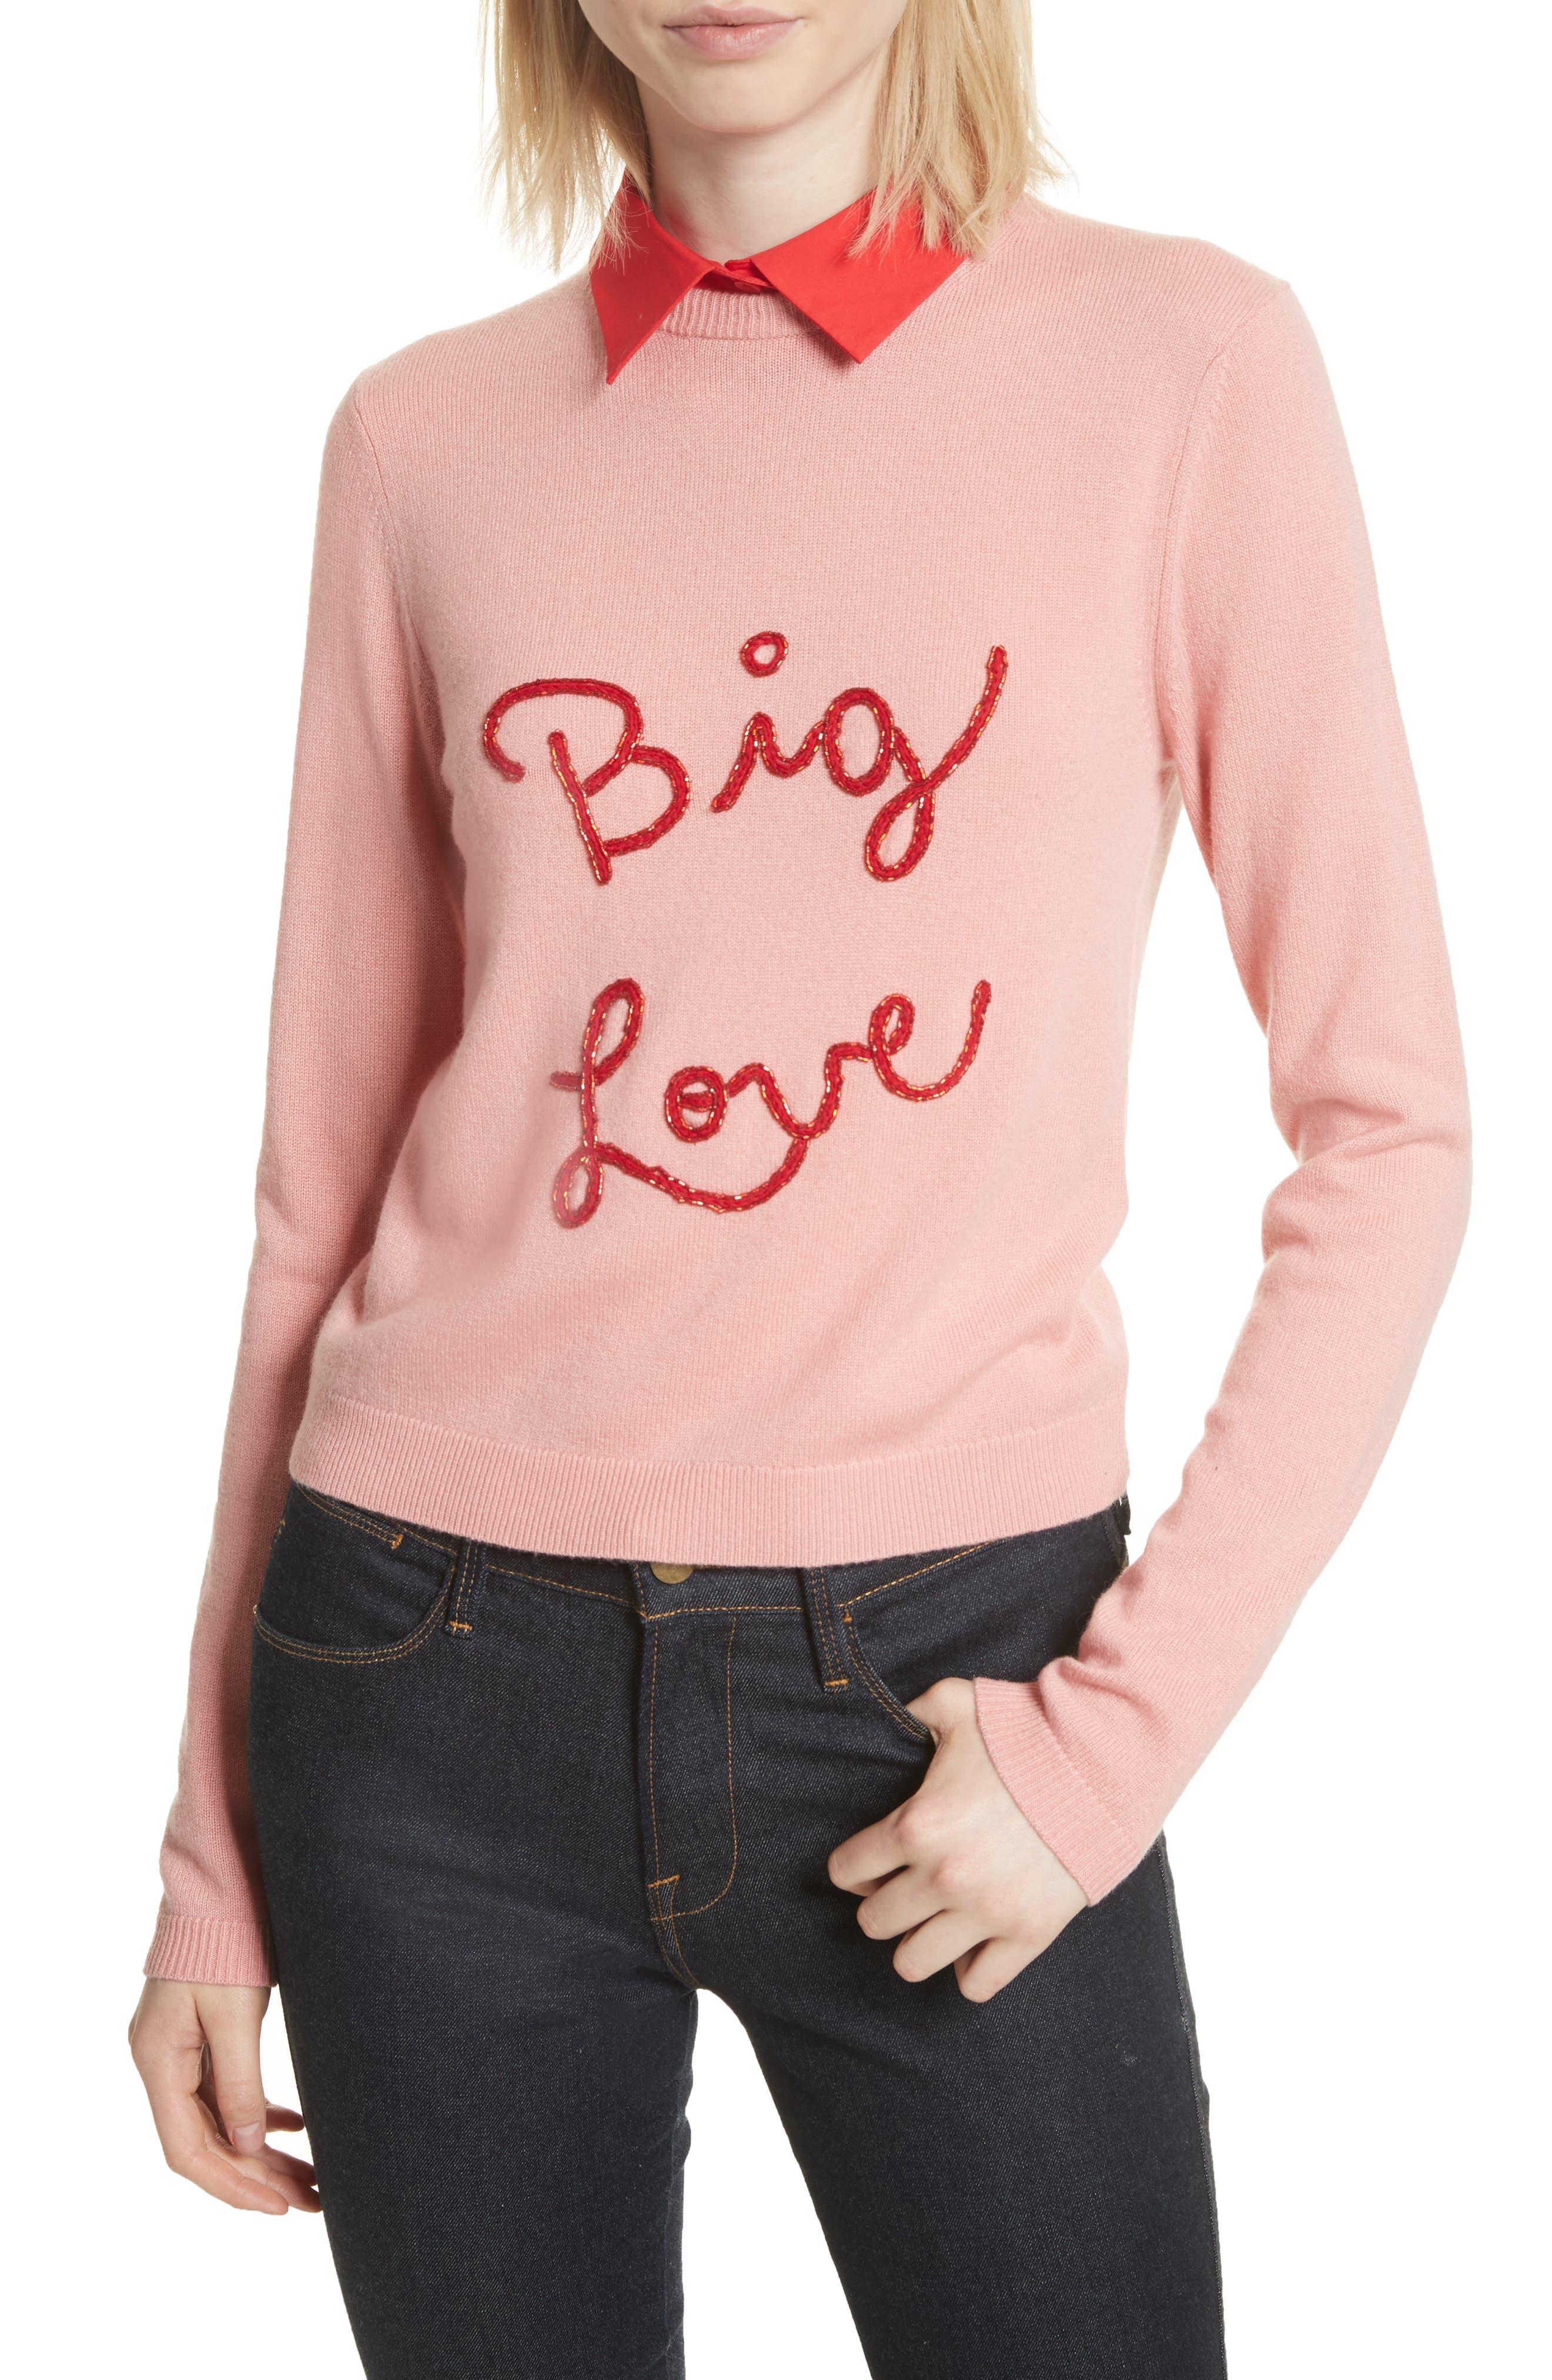 ALICE + OLIVIA Big Love Embroidered Cashmere Sweater, Main, color, 651